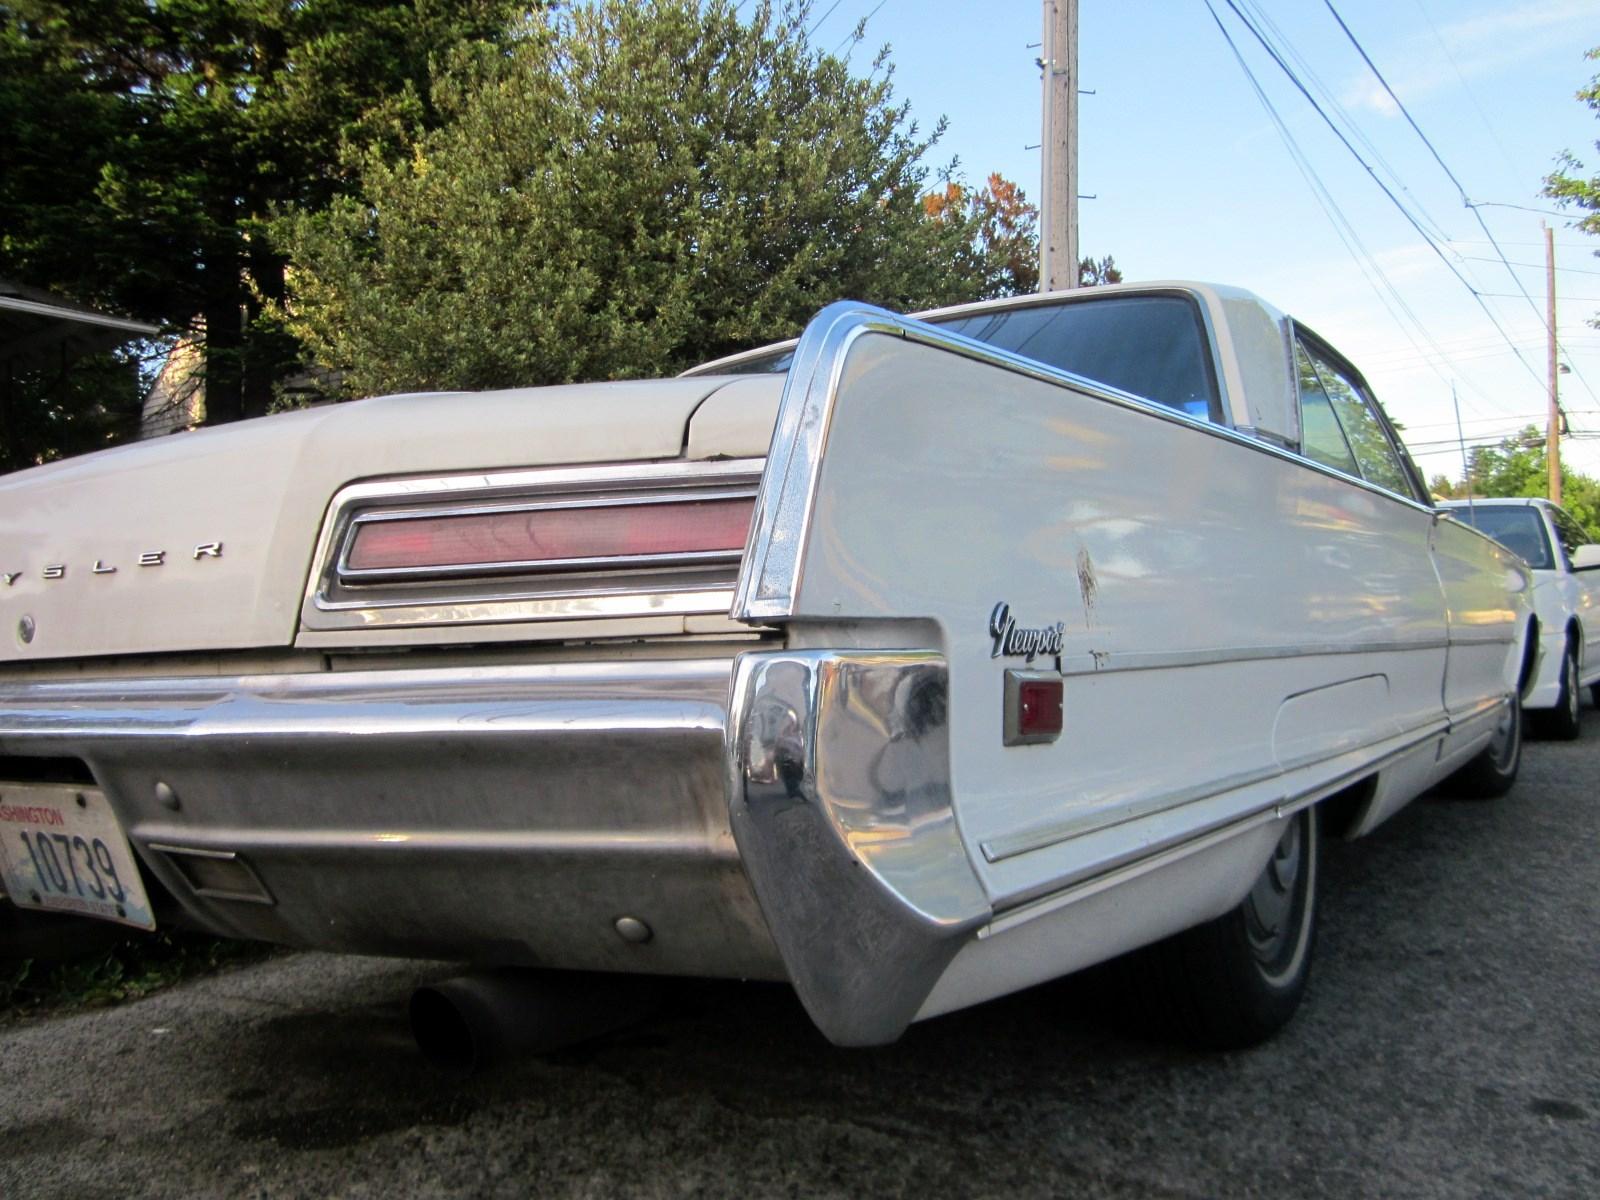 chrysler newport us seattle39s classics 1966 chrysler newport